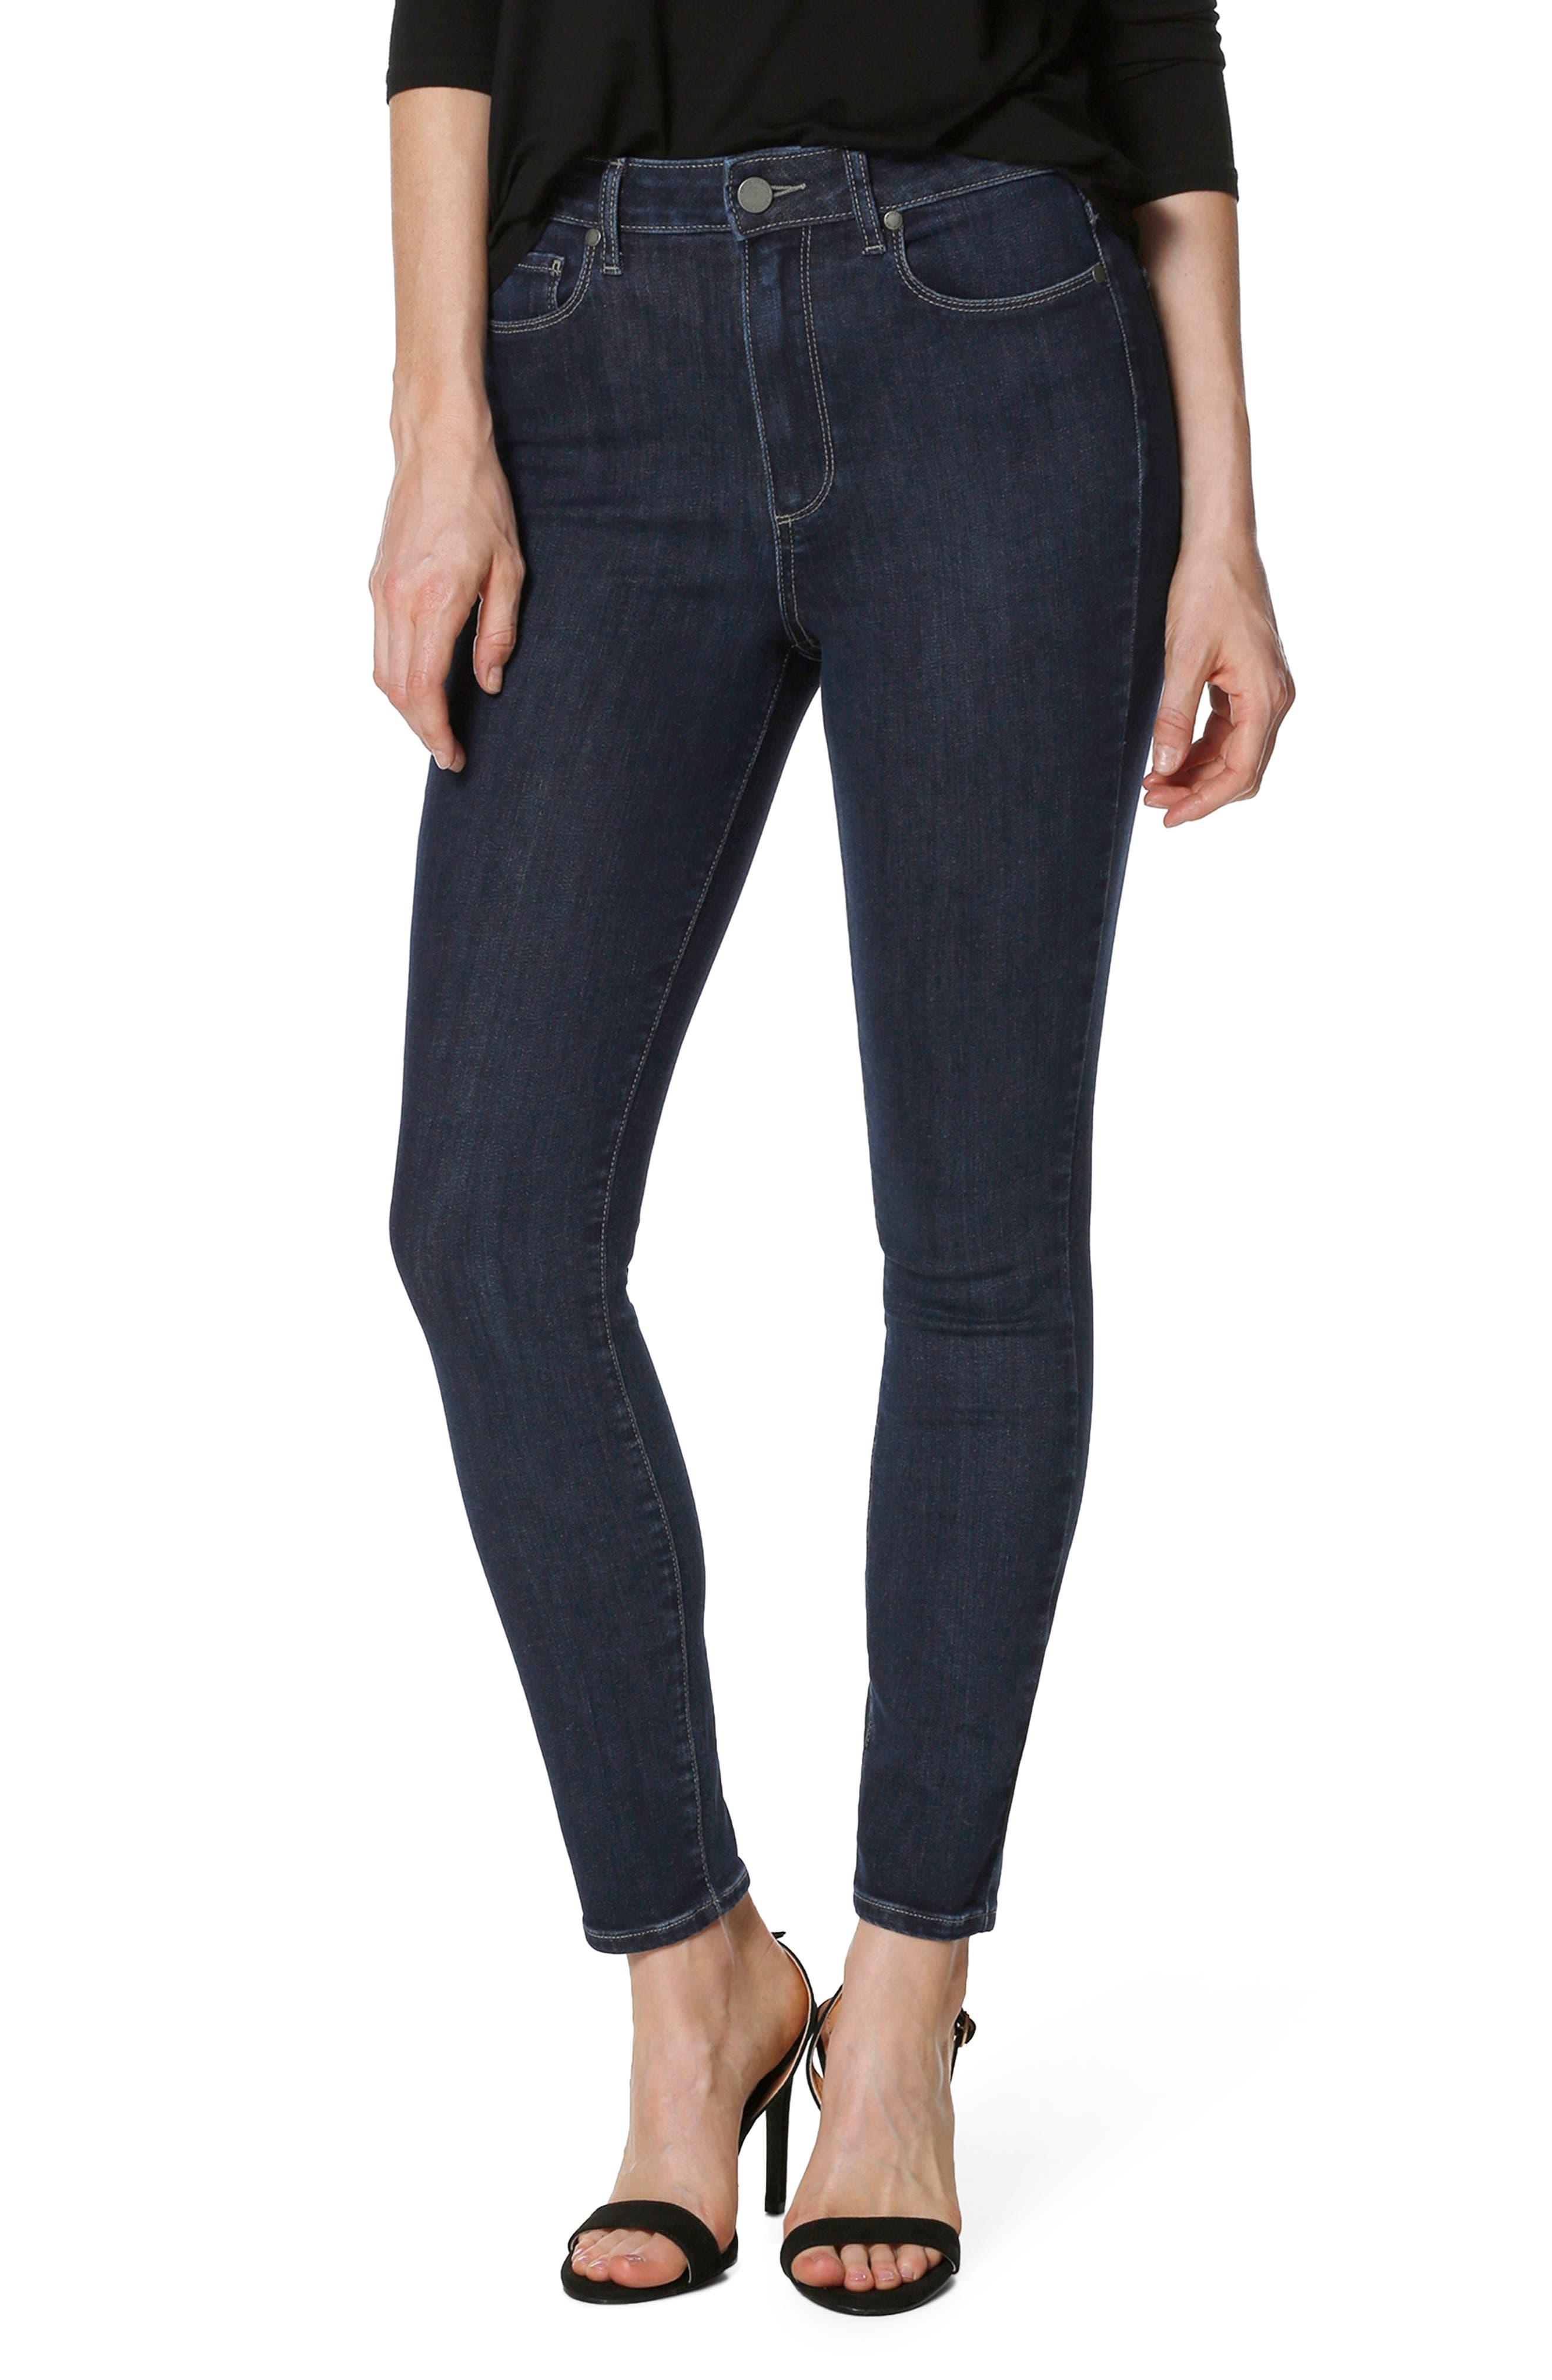 Transcend Vintage - Margot High Waist Ankle Ultra Skinny Jeans,                             Main thumbnail 1, color,                             Regal